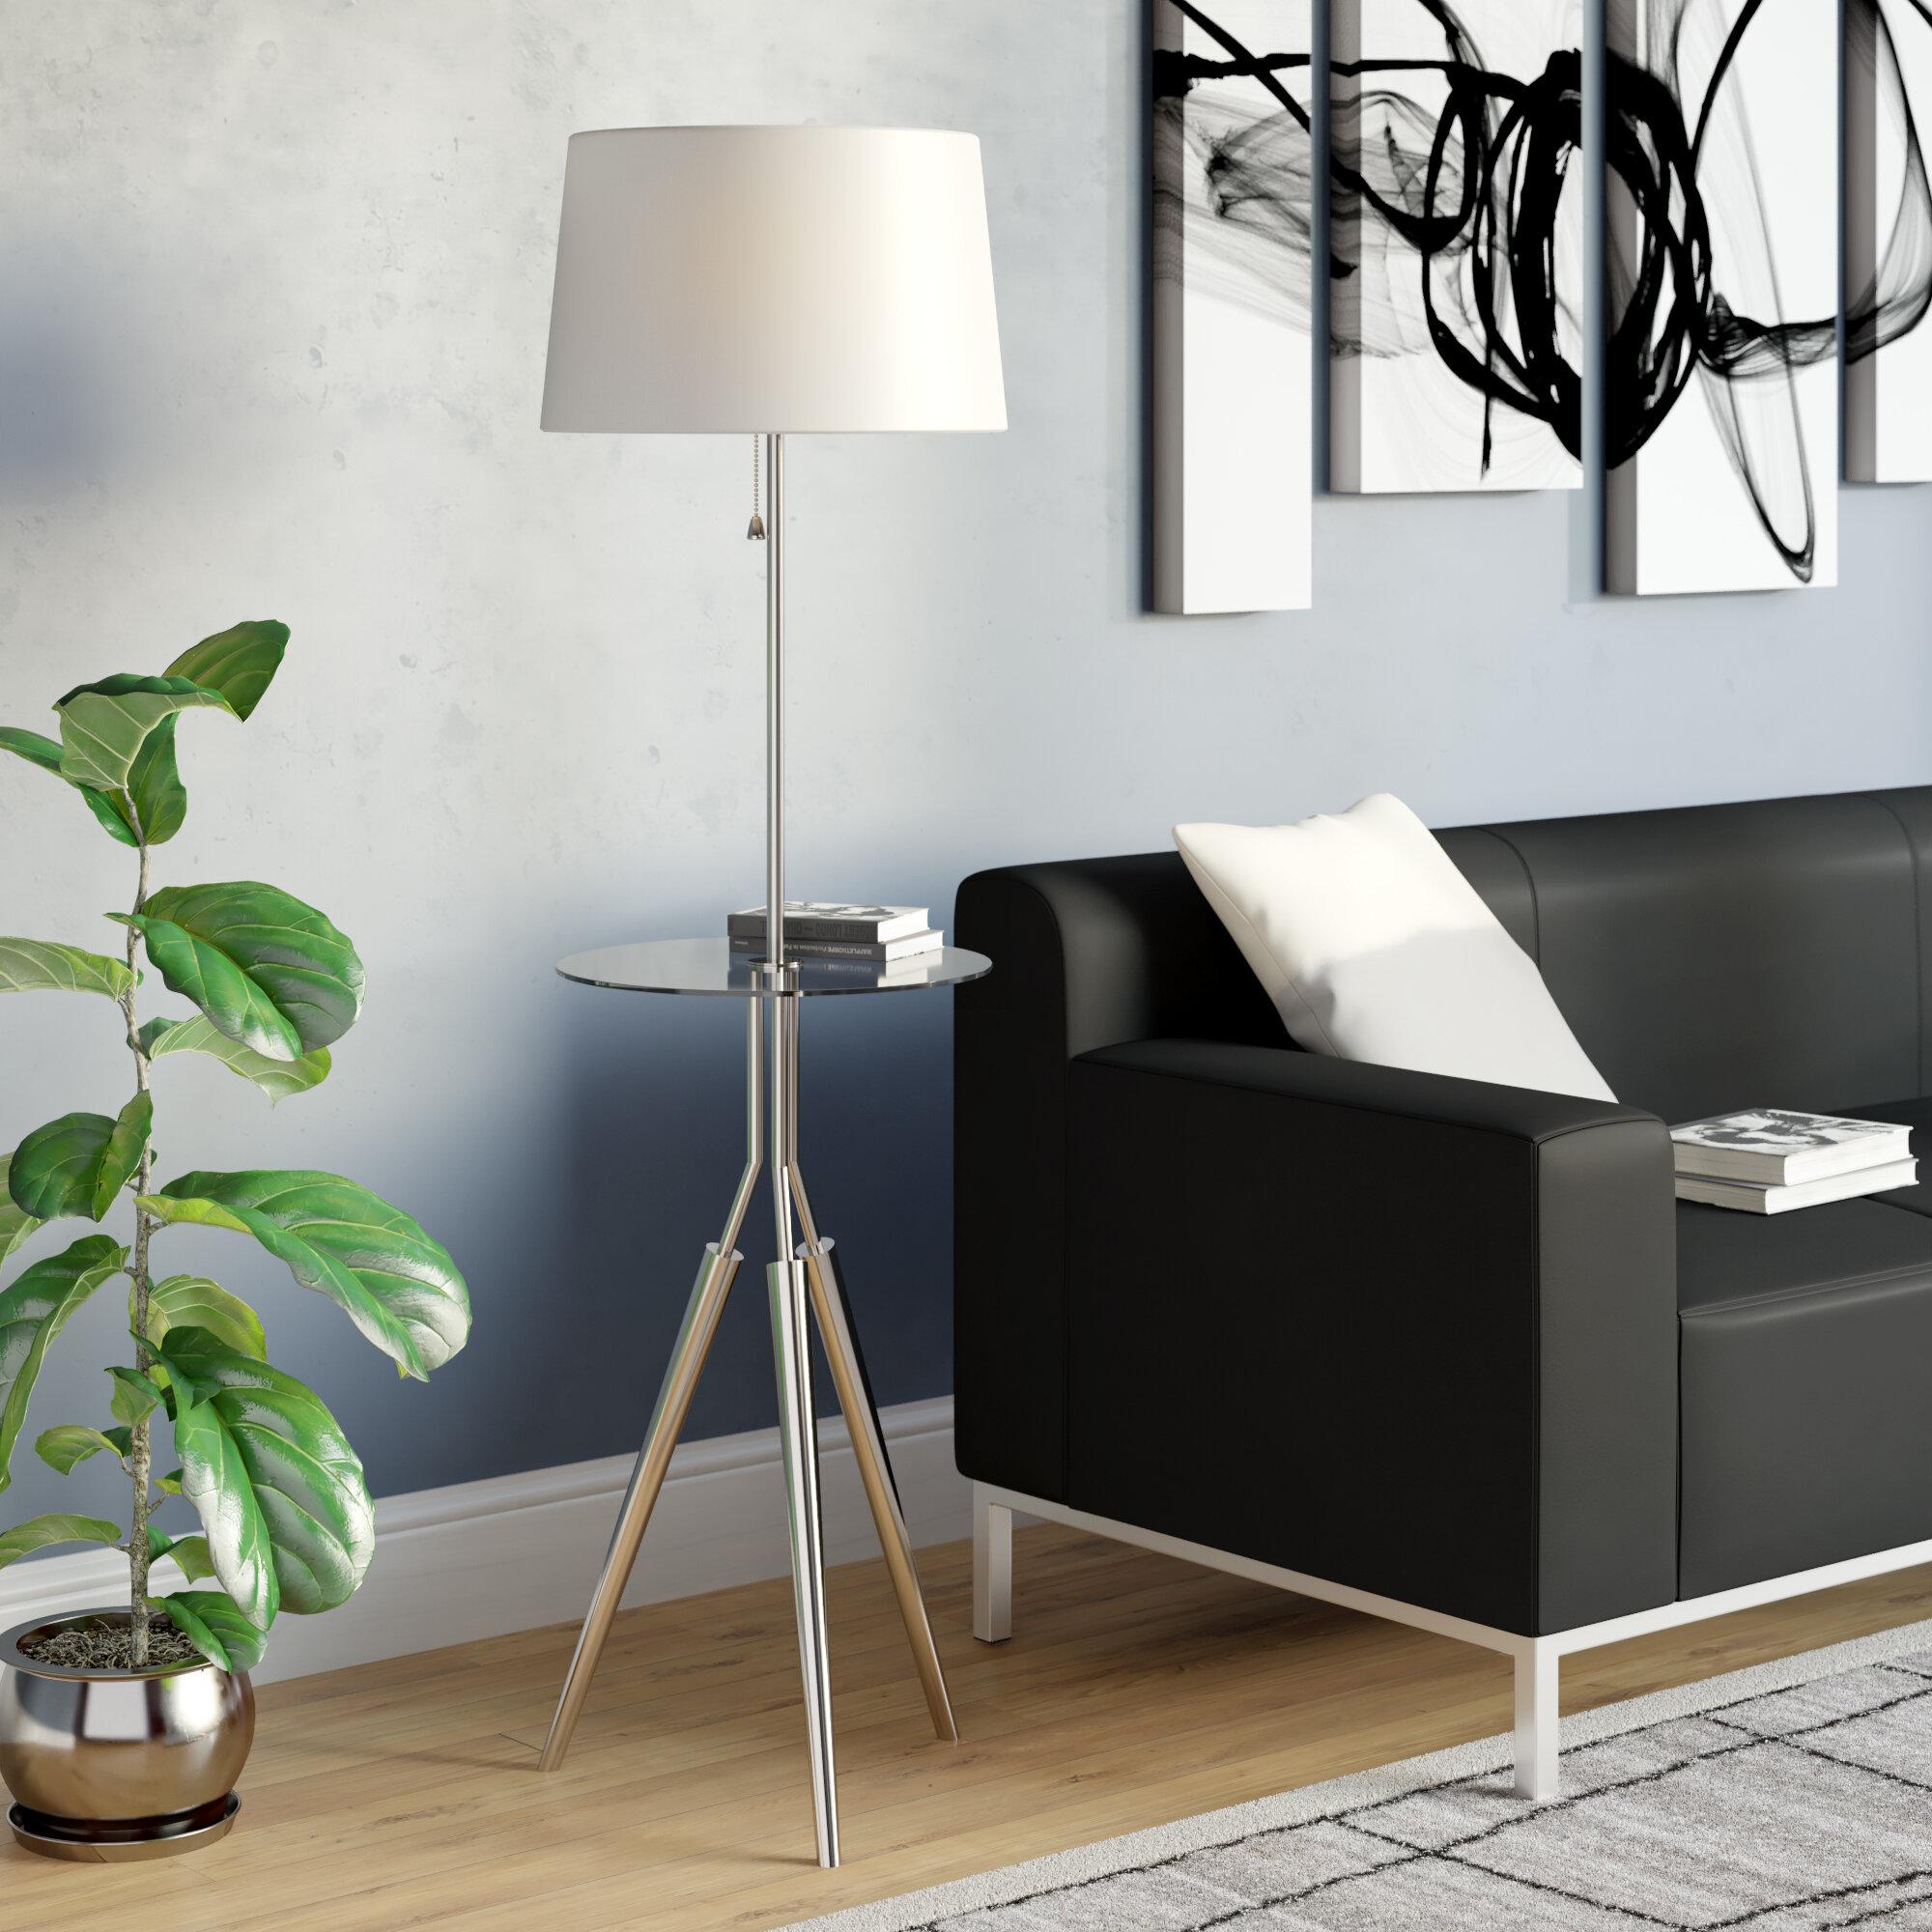 Garton 58 Tray Table Floor Lamp